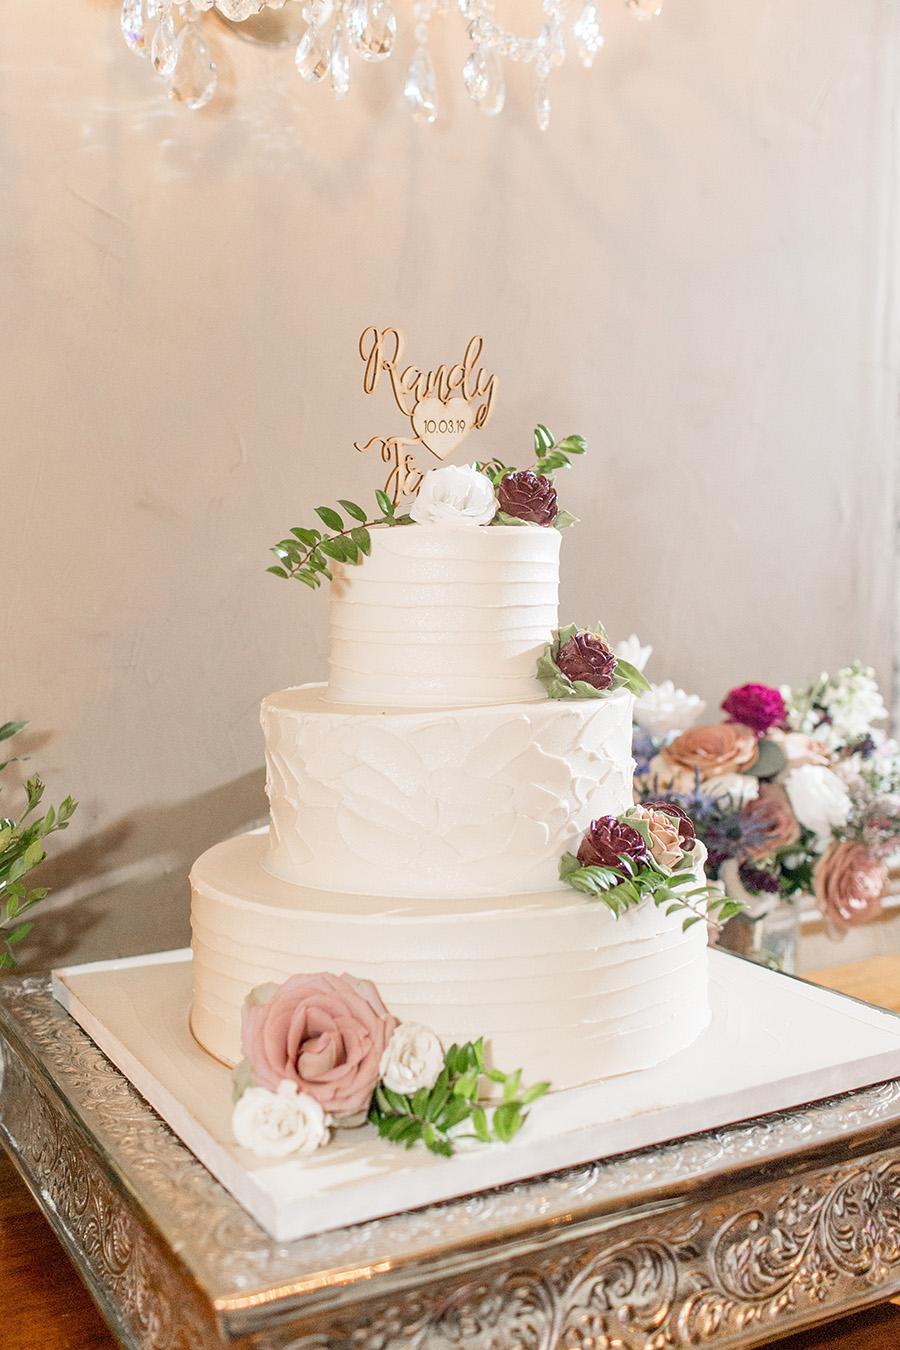 Burgundy and blush wedding cake